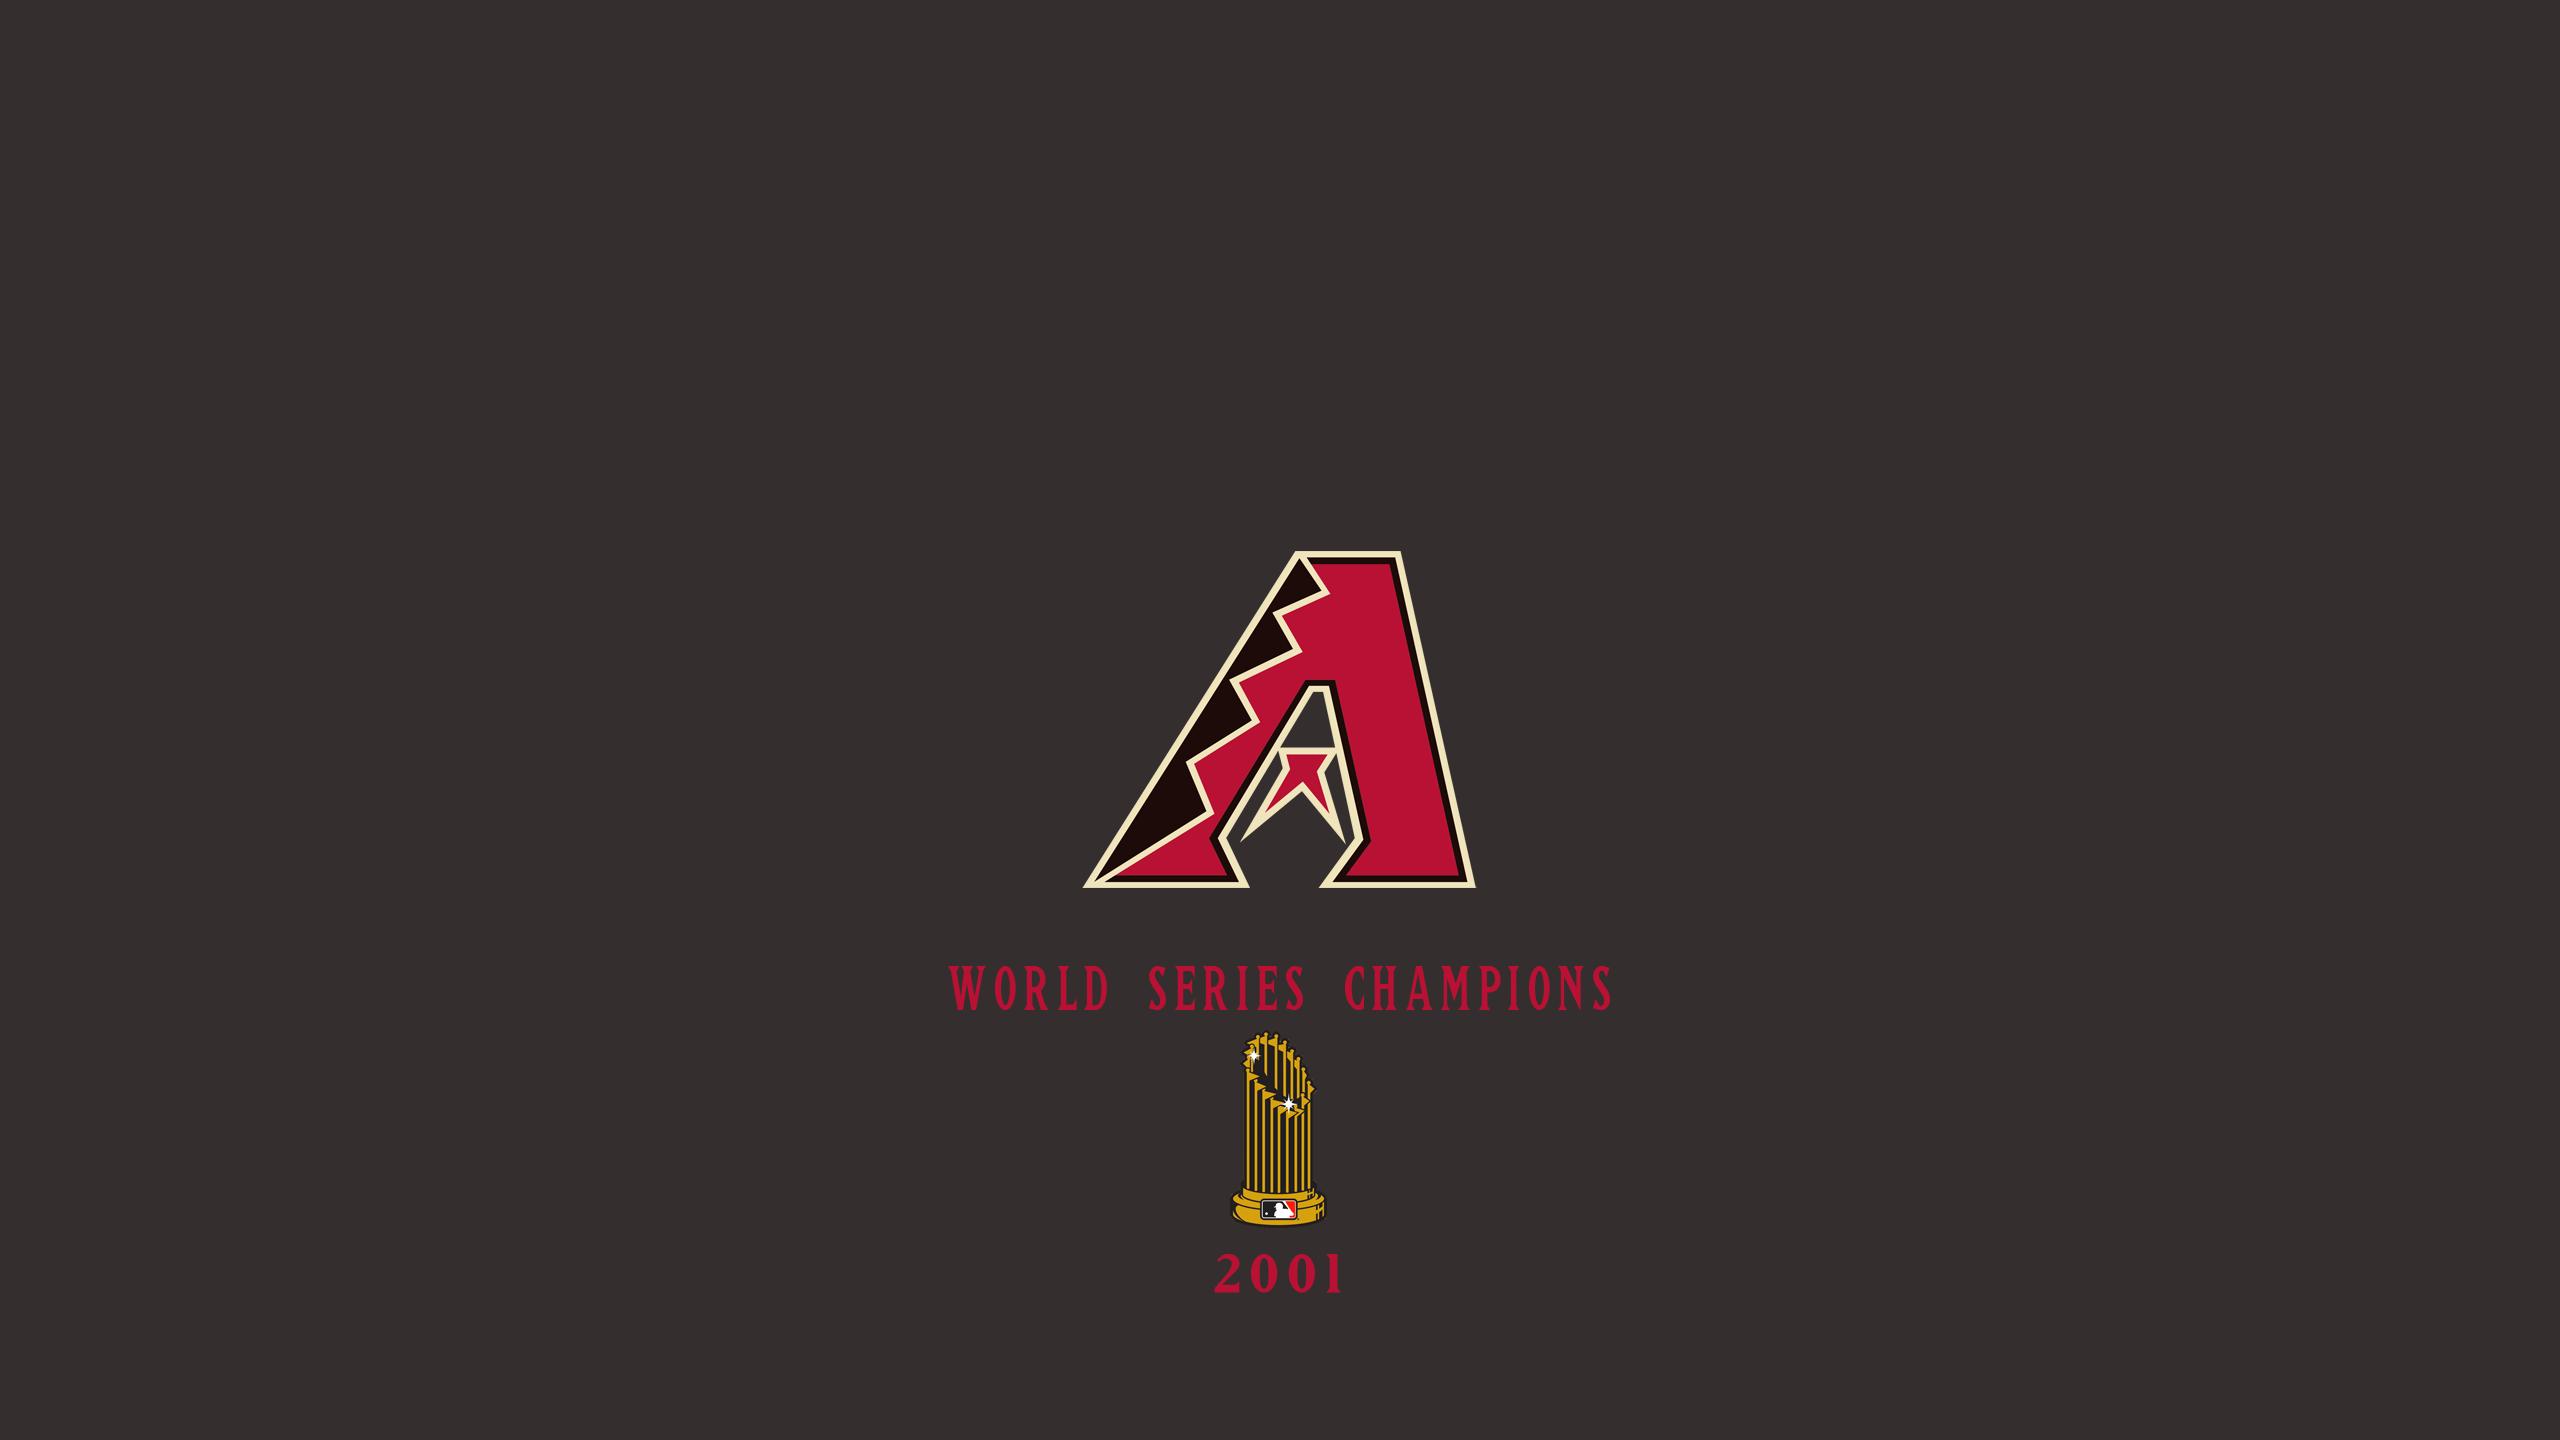 Arizona Diamondbacks - World Series Champs